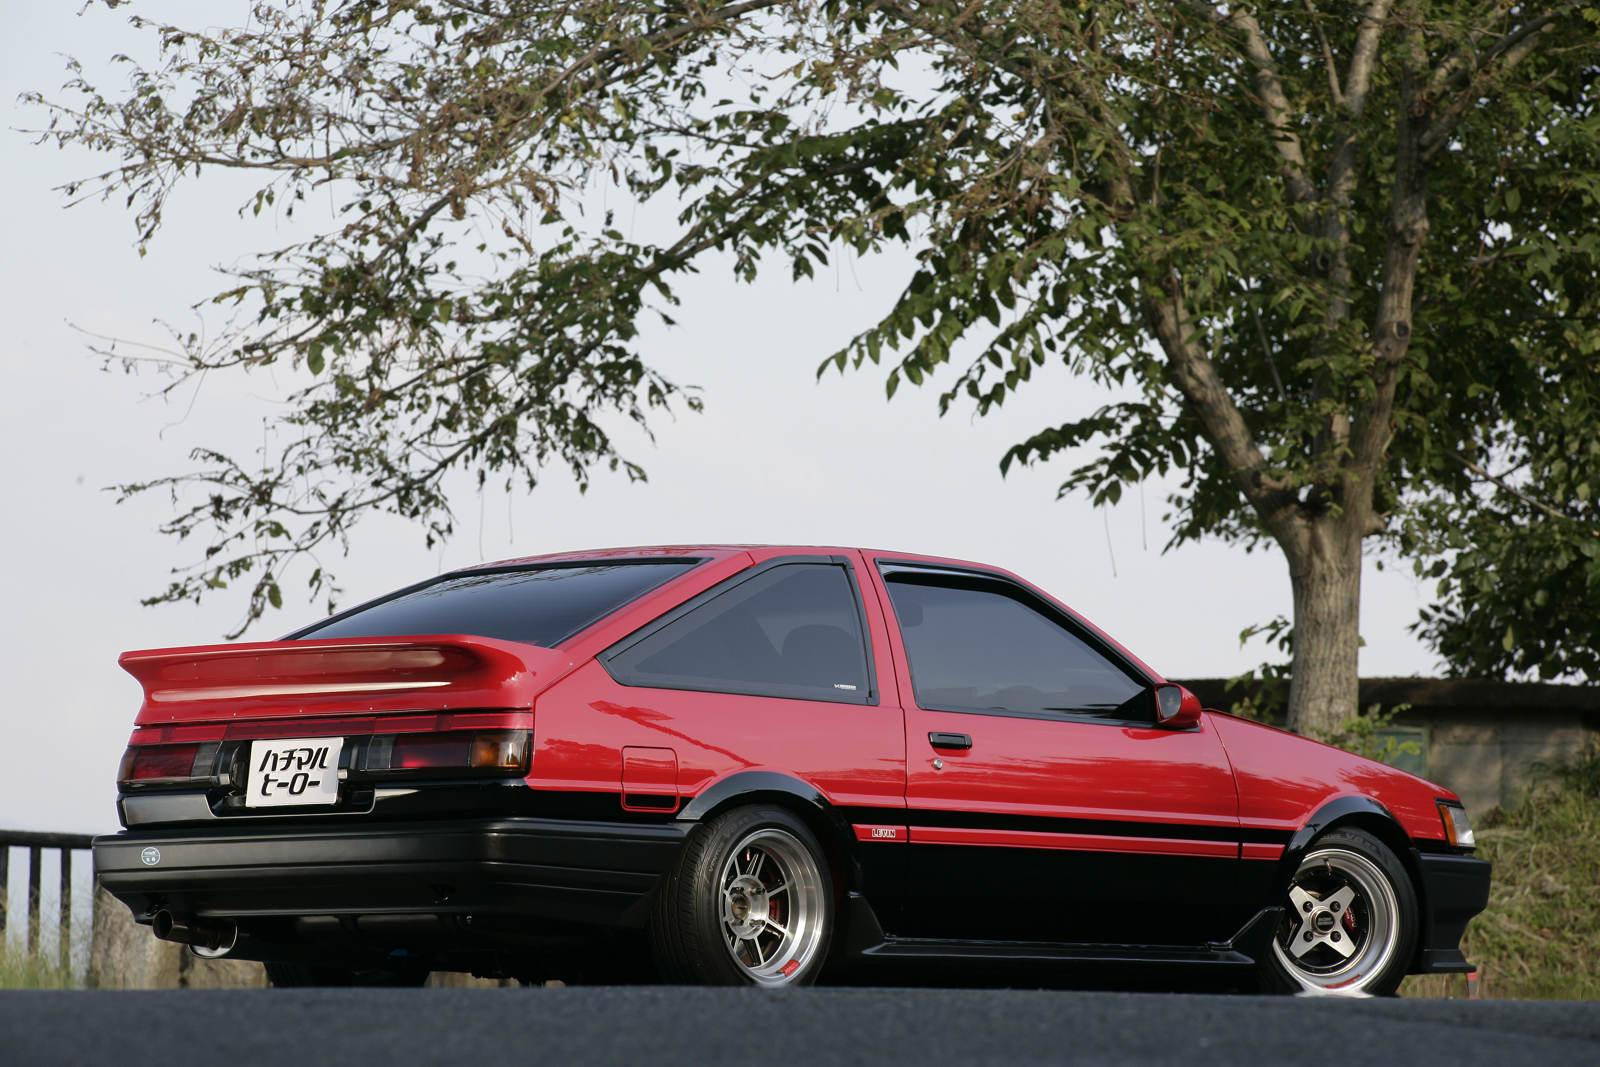 Hachi-Roku, sportowy samochód, JDM, Toyota, Corolla Levin, Sprinter Trueno, galeria